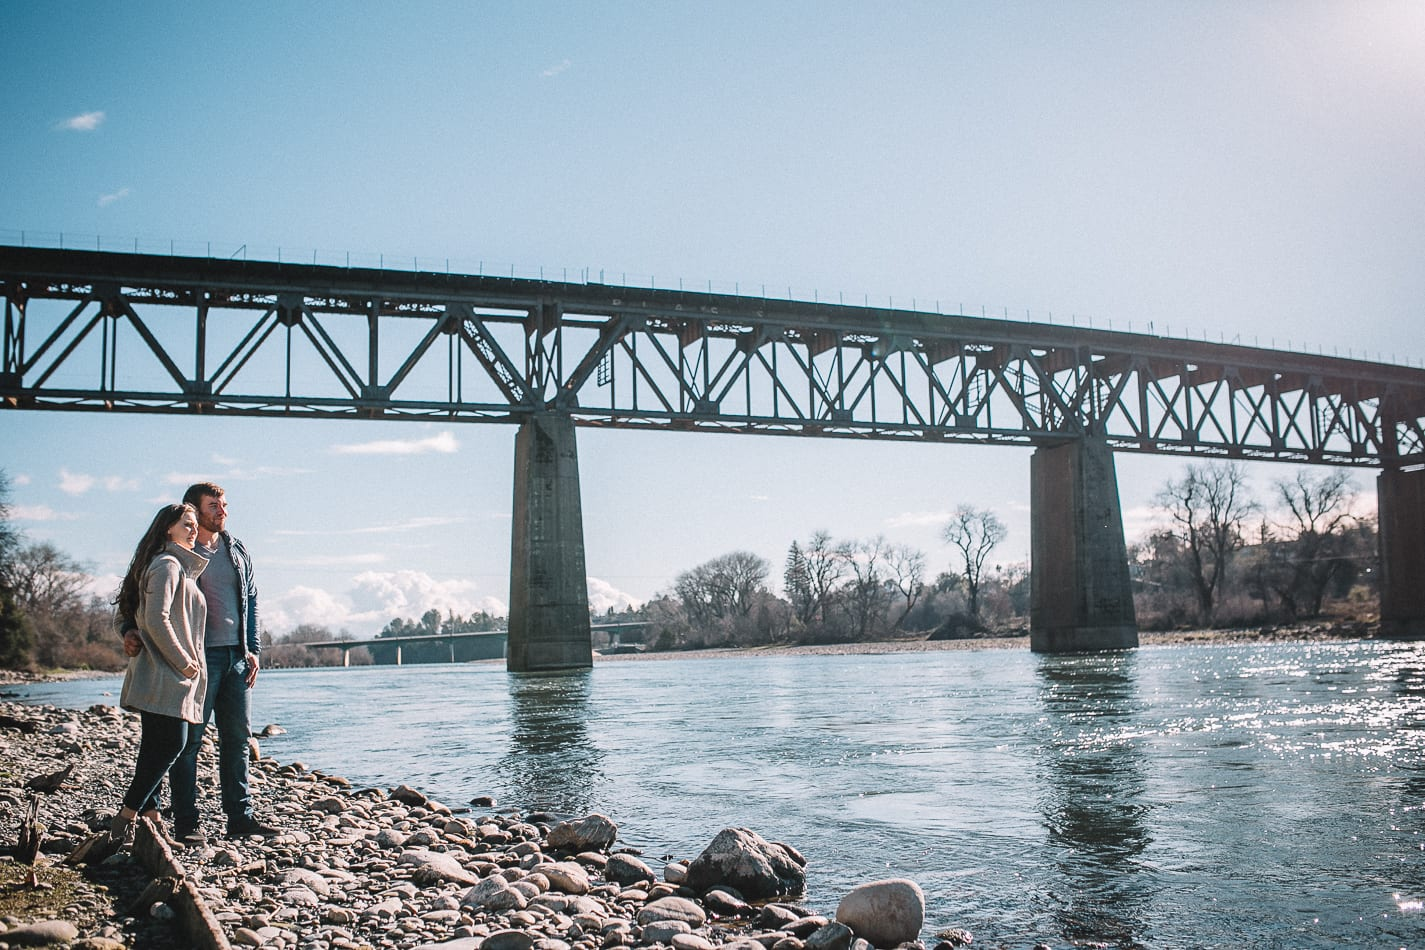 caldwell-park-diesel-horse-bridge-engagement-photo-6